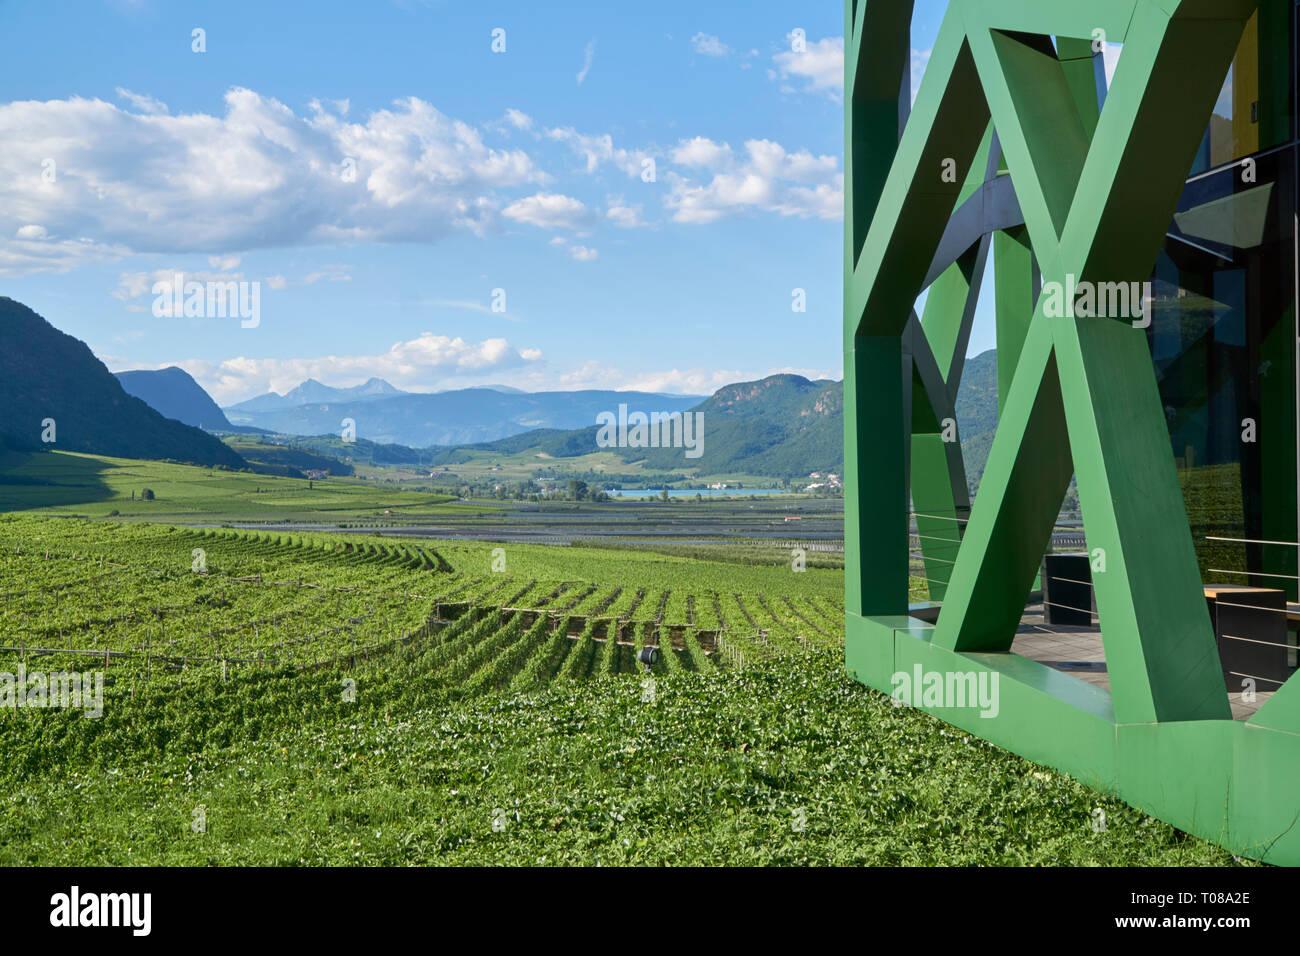 Winzergenossenschaft Tramin, Südtirol Stockbild